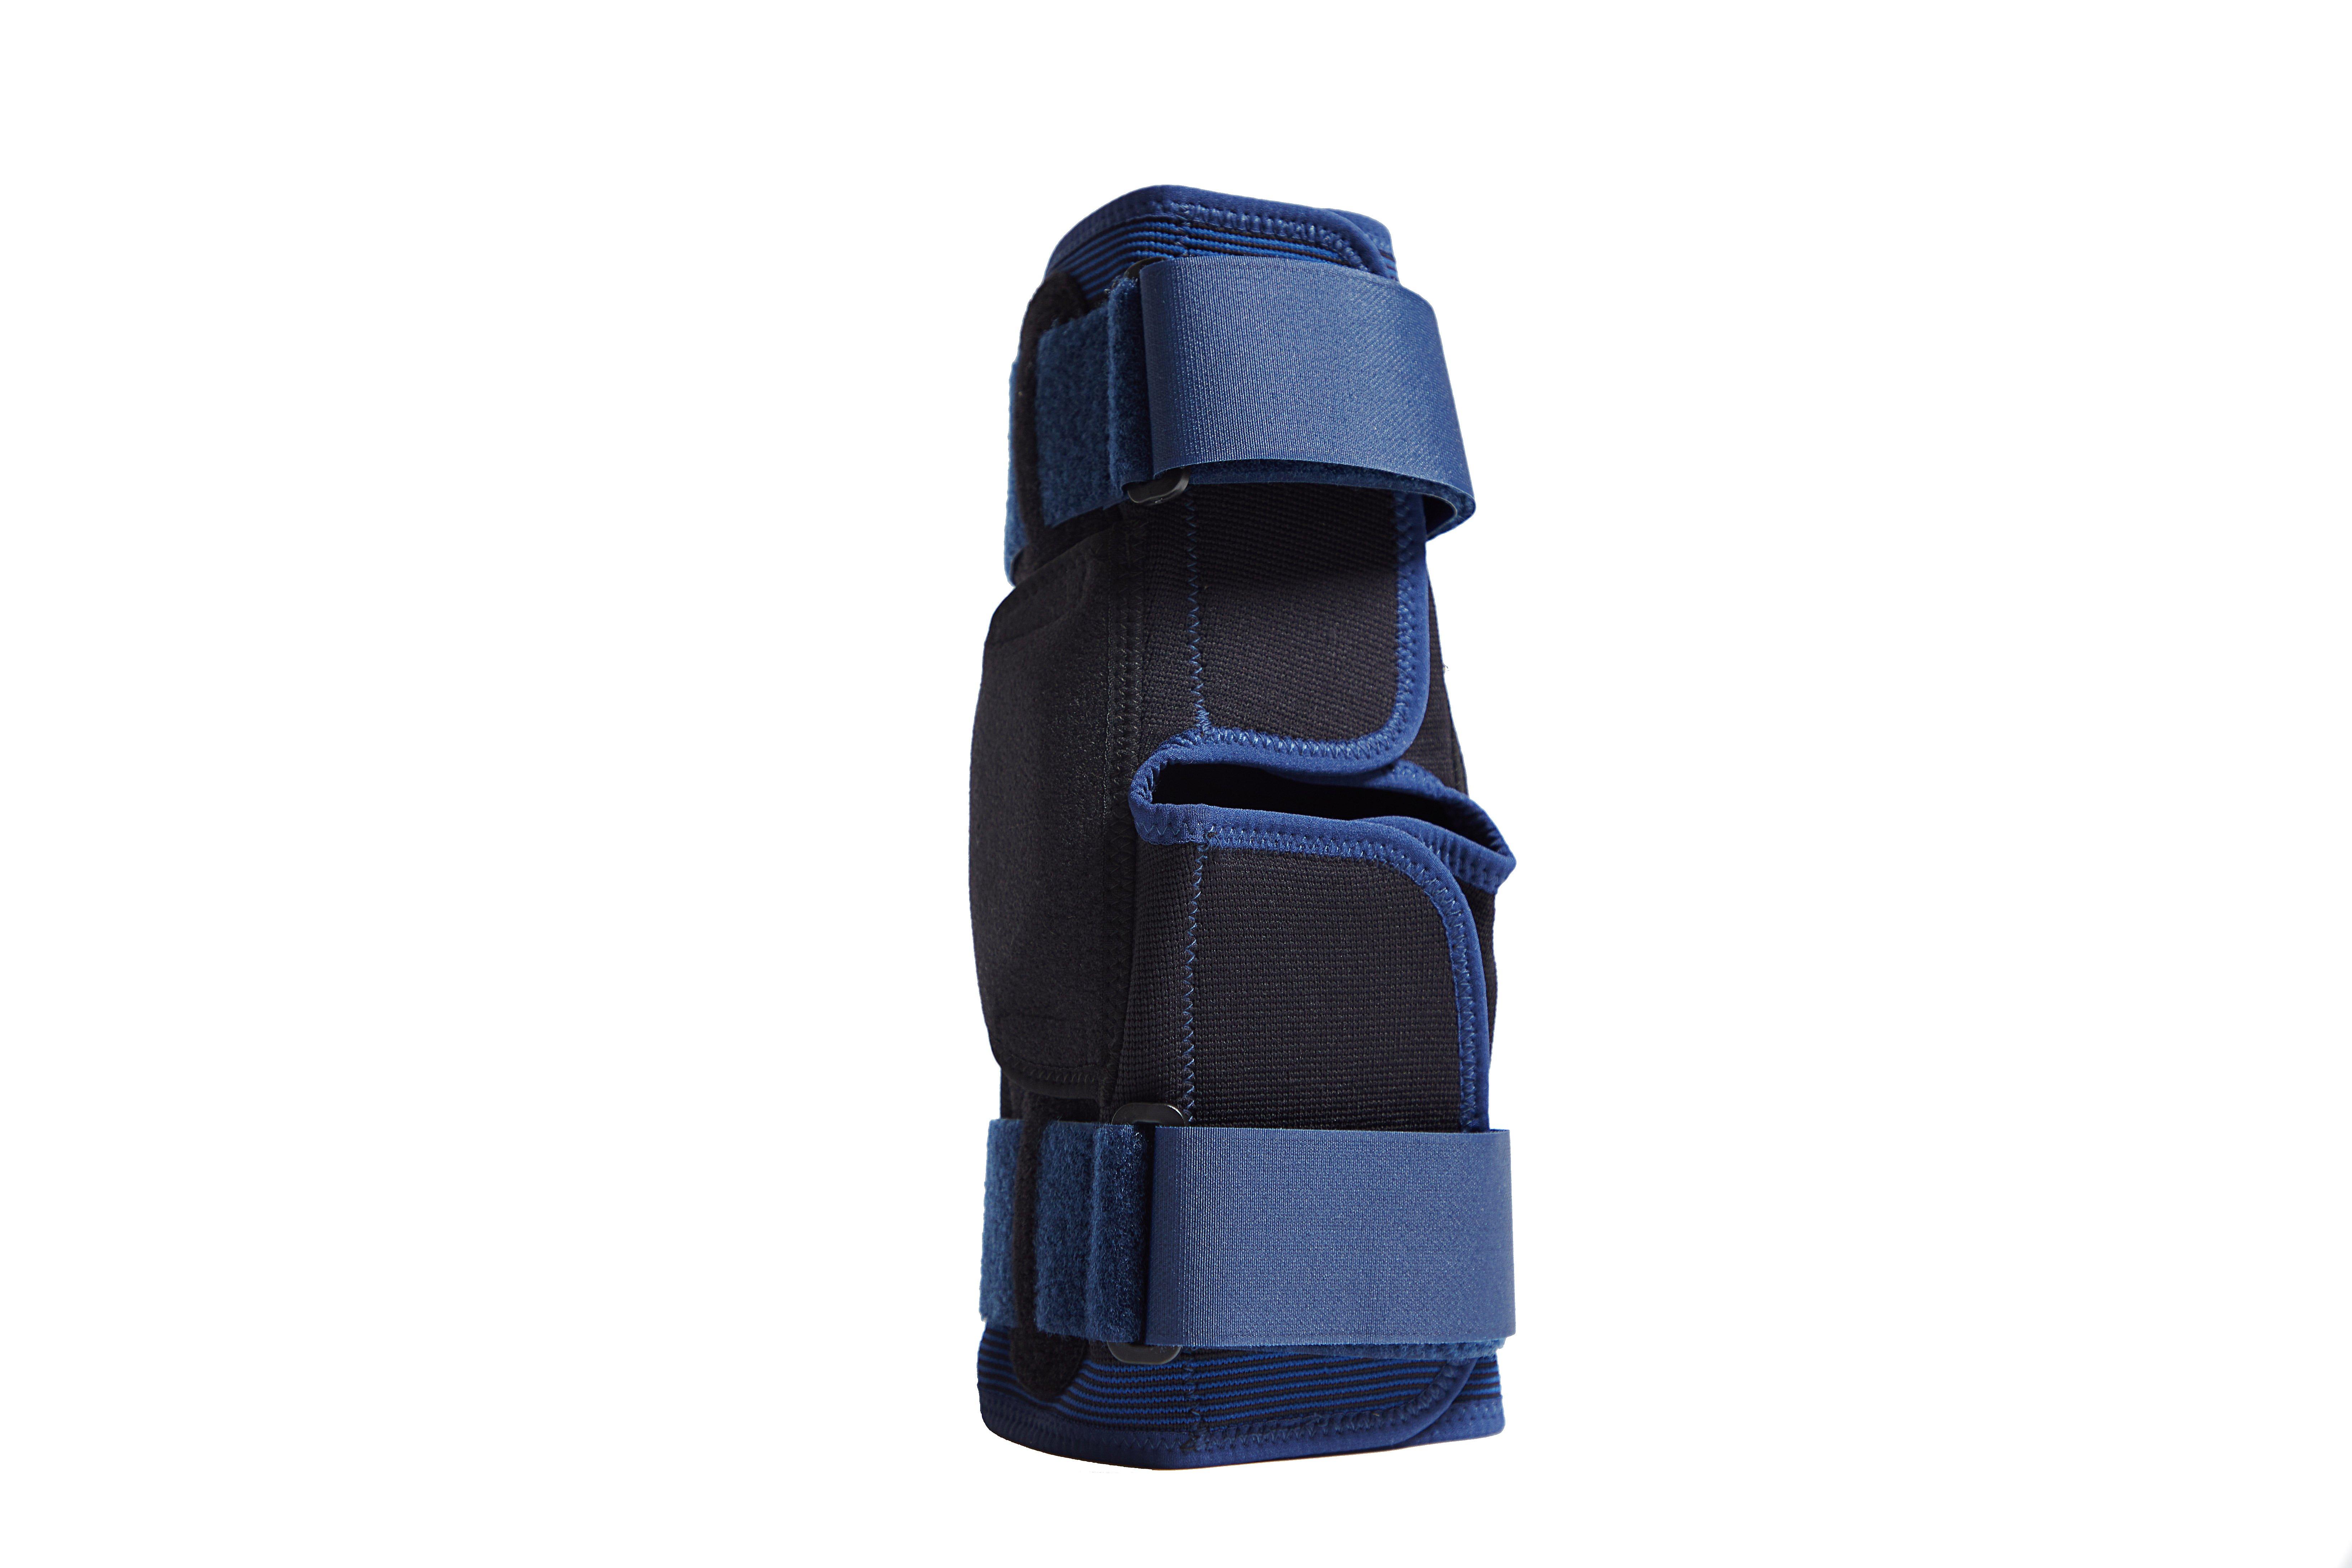 Quicksilver Knee Brace